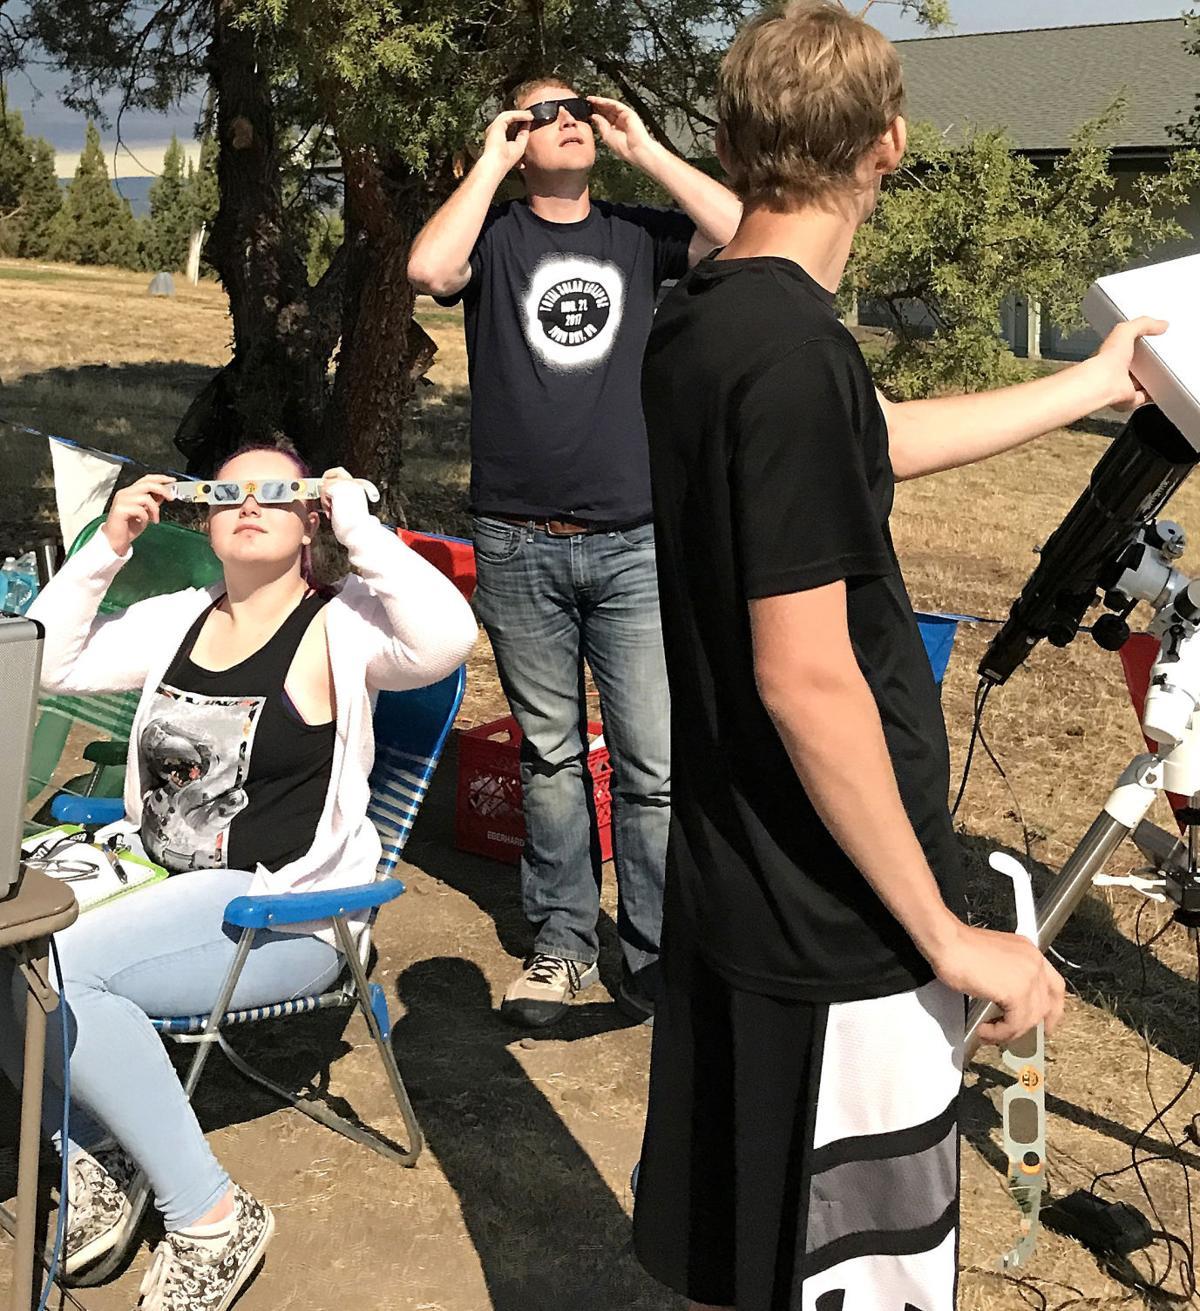 SOLAR SCIENCEGrant Union science teacher, students complete solar mission